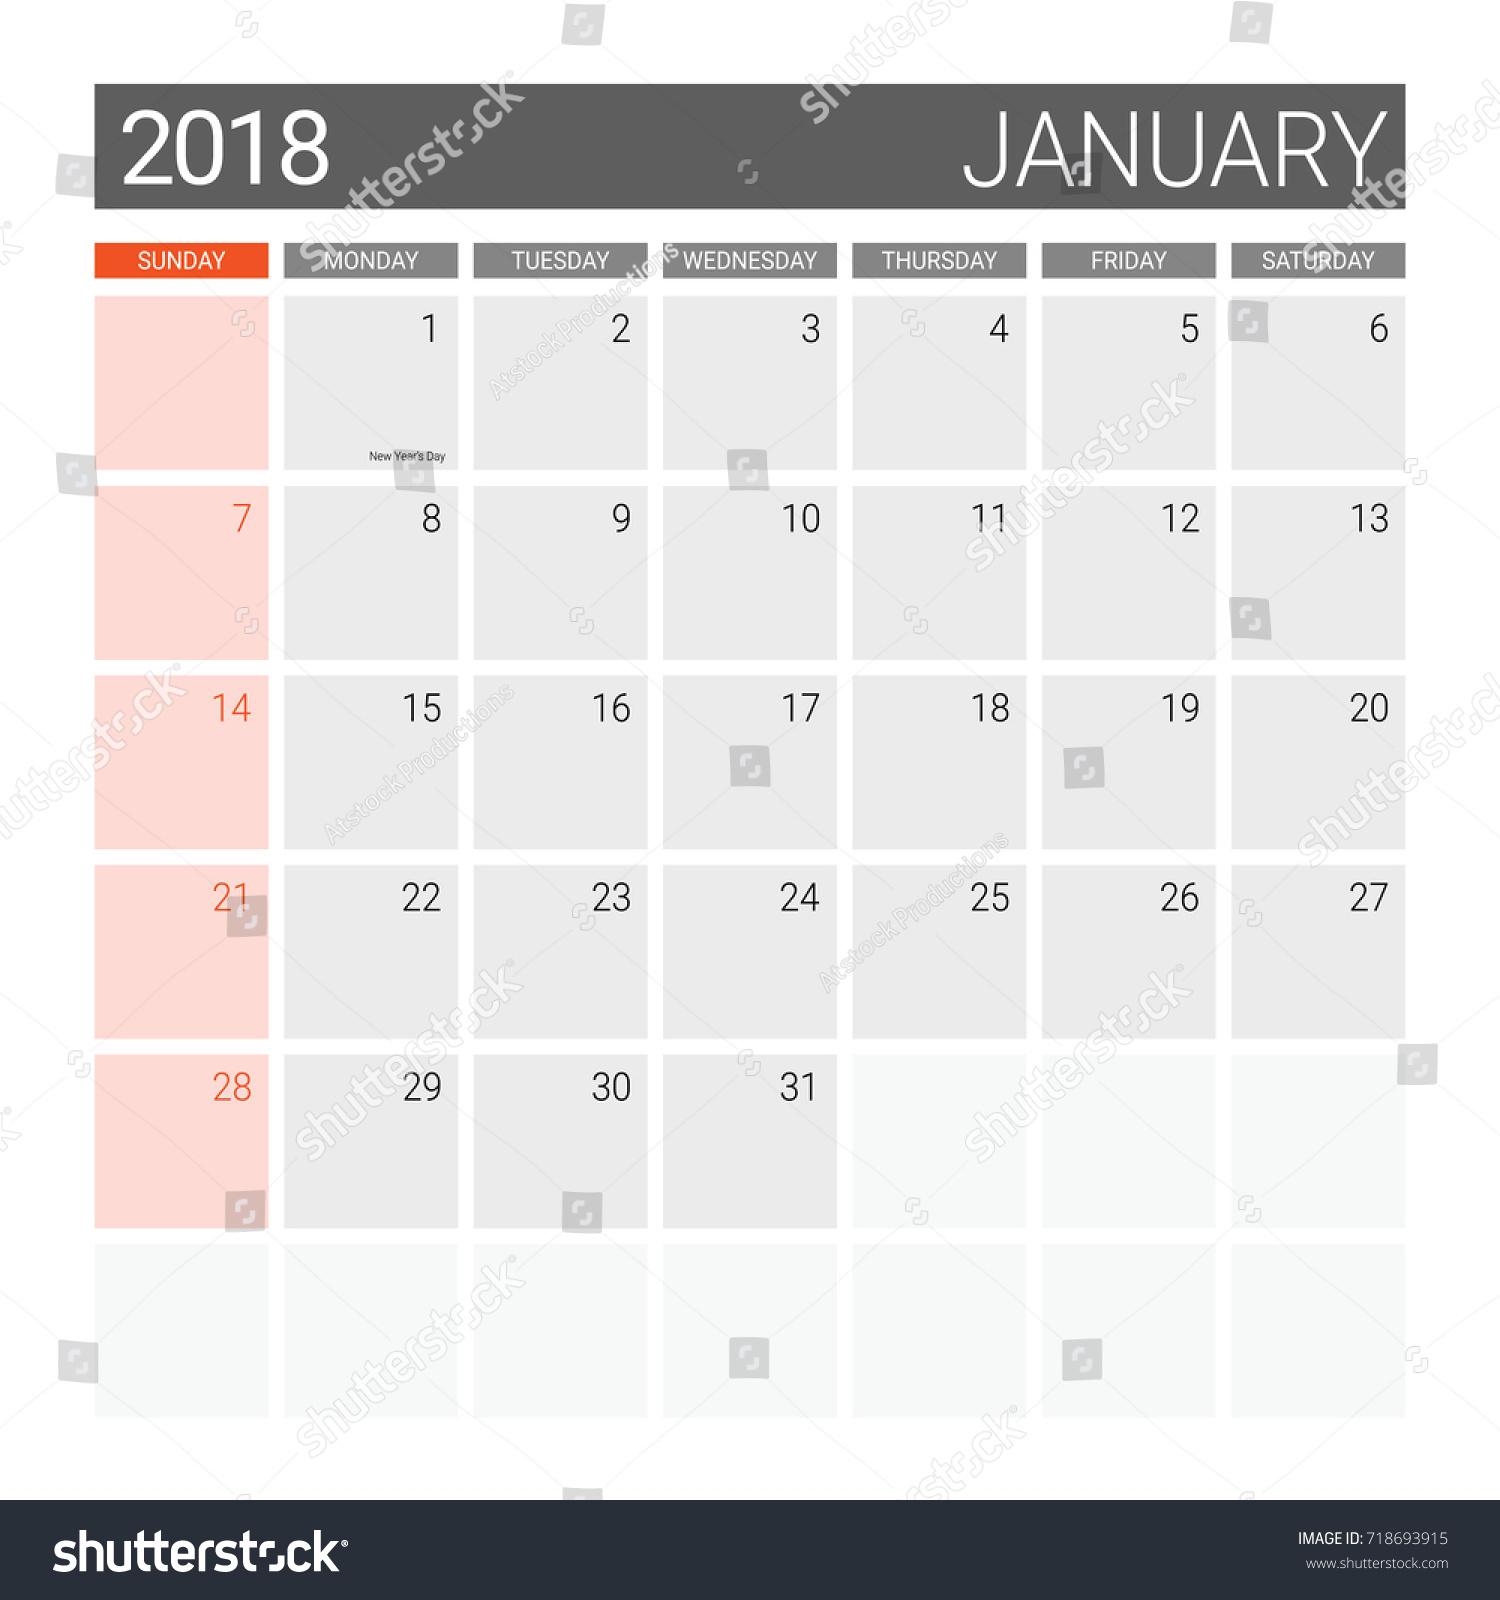 2018 january calendar or desk planner weeks start on sunday gray theme square